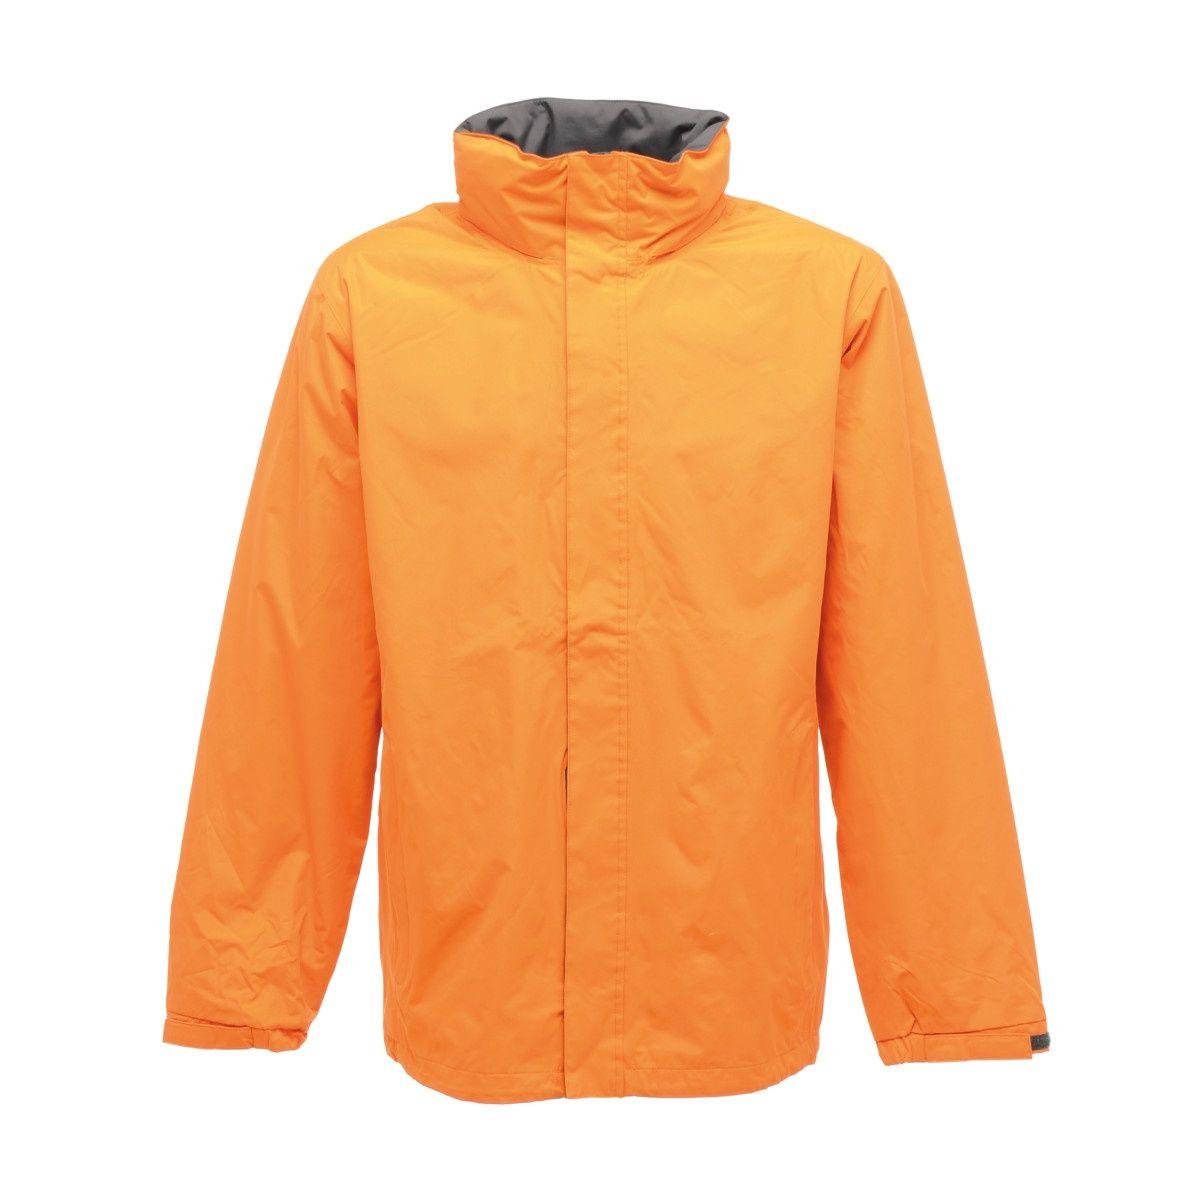 Regatta Mens Standout Ardmore Jacket (Waterproof & Windproof)